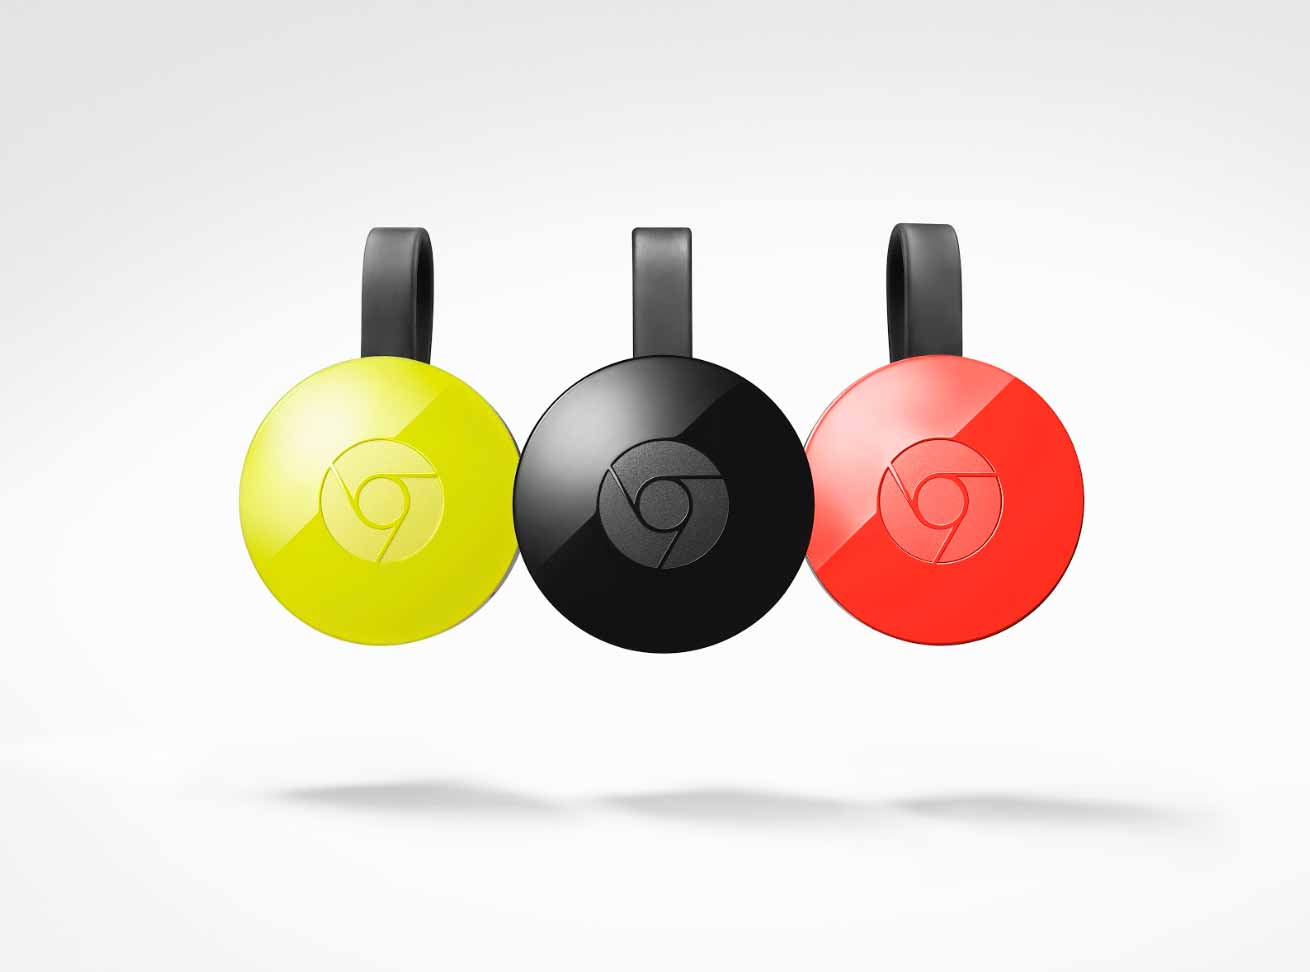 Google、新しい「Chromecast」と「Chromecast Audio」を日本でも販売開始